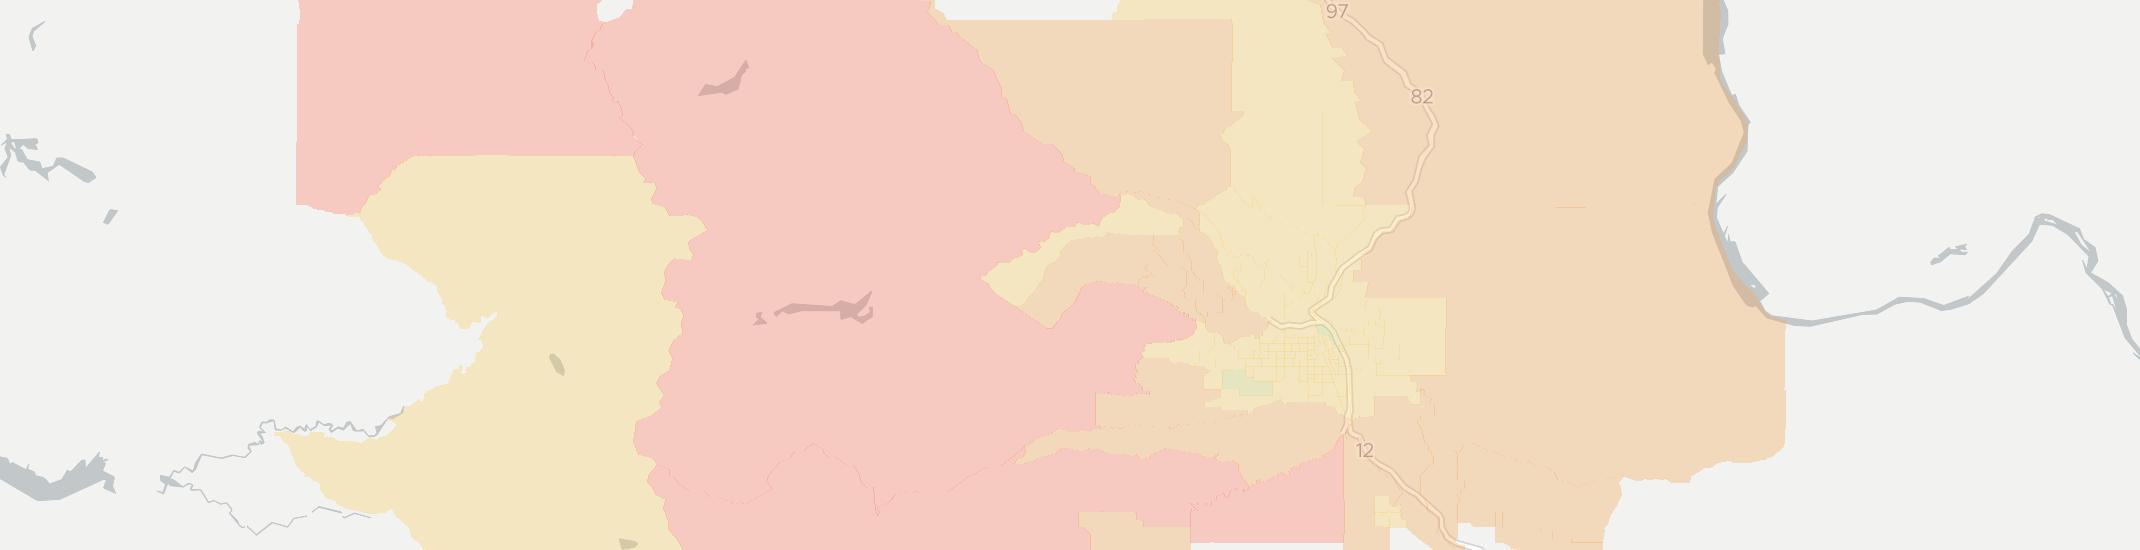 11 Best Internet Service Providers in Yakima, WA (Aug, 2019) Yakima City Street Map on yakima county map detailed, yakima city art, yakima fairgrounds map, yakima wine country map, yakima hotels, hermiston or street map, yakima fire department, little naches orv map, city of yakima zoning map, sunnyside wa street map, ellensburg street map, yakima valley map, yakima tribe map, yakima airport, yakima oregon map, yakima city hall, yakima road map, yakima county on map, yakima firing range map, yakima restaurant map,